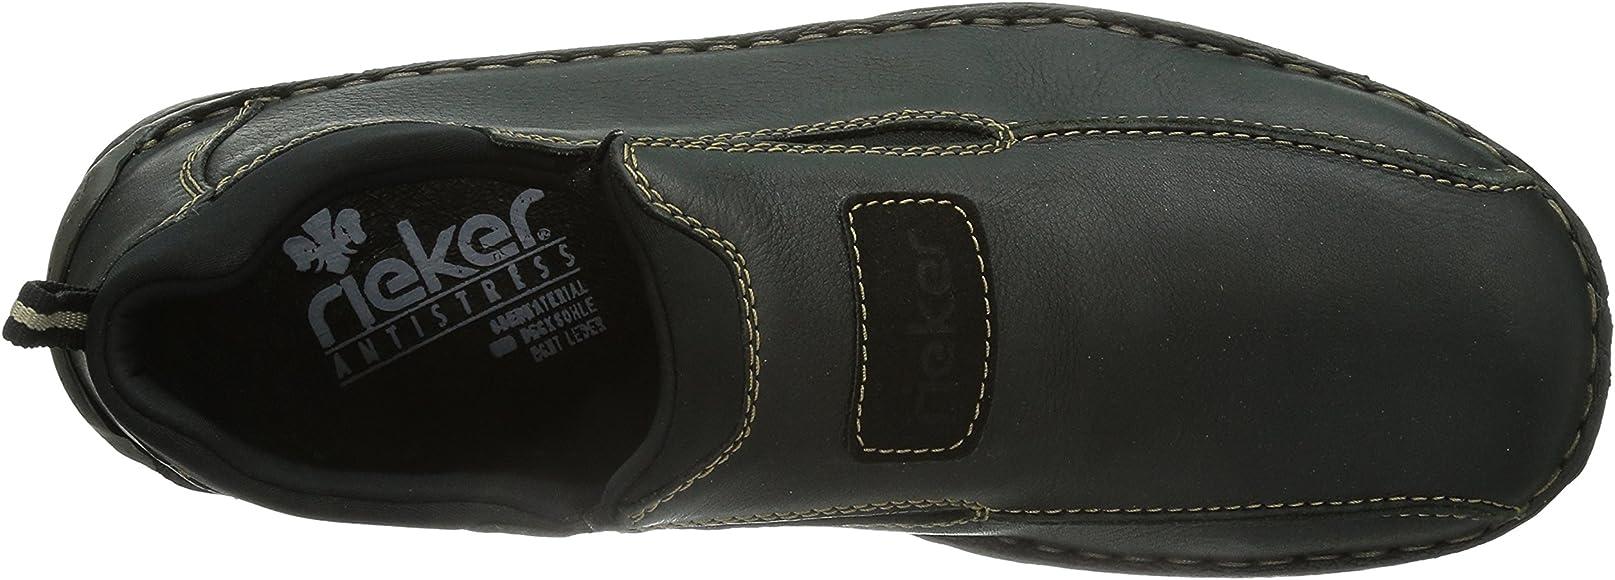 Rieker 05363 Schuhe Herren Slipper extra weit   eBay